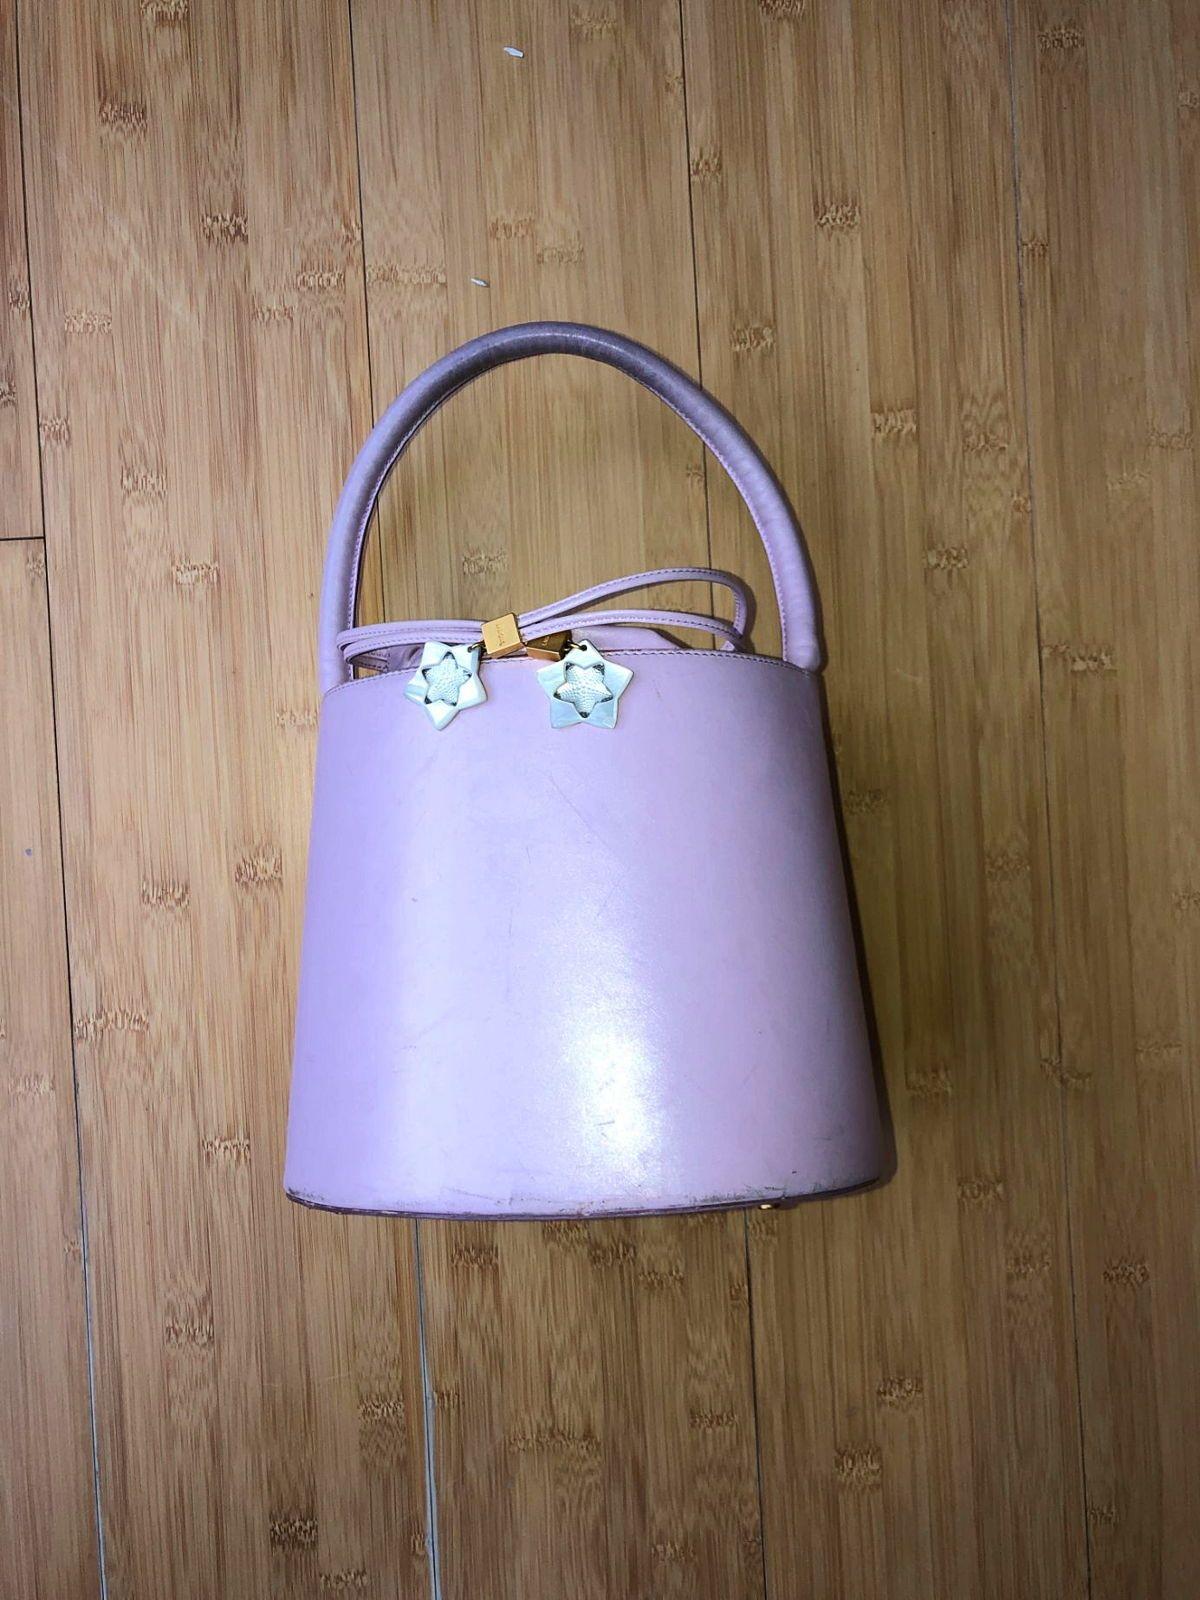 Vends Sac à main en cuir Lalique